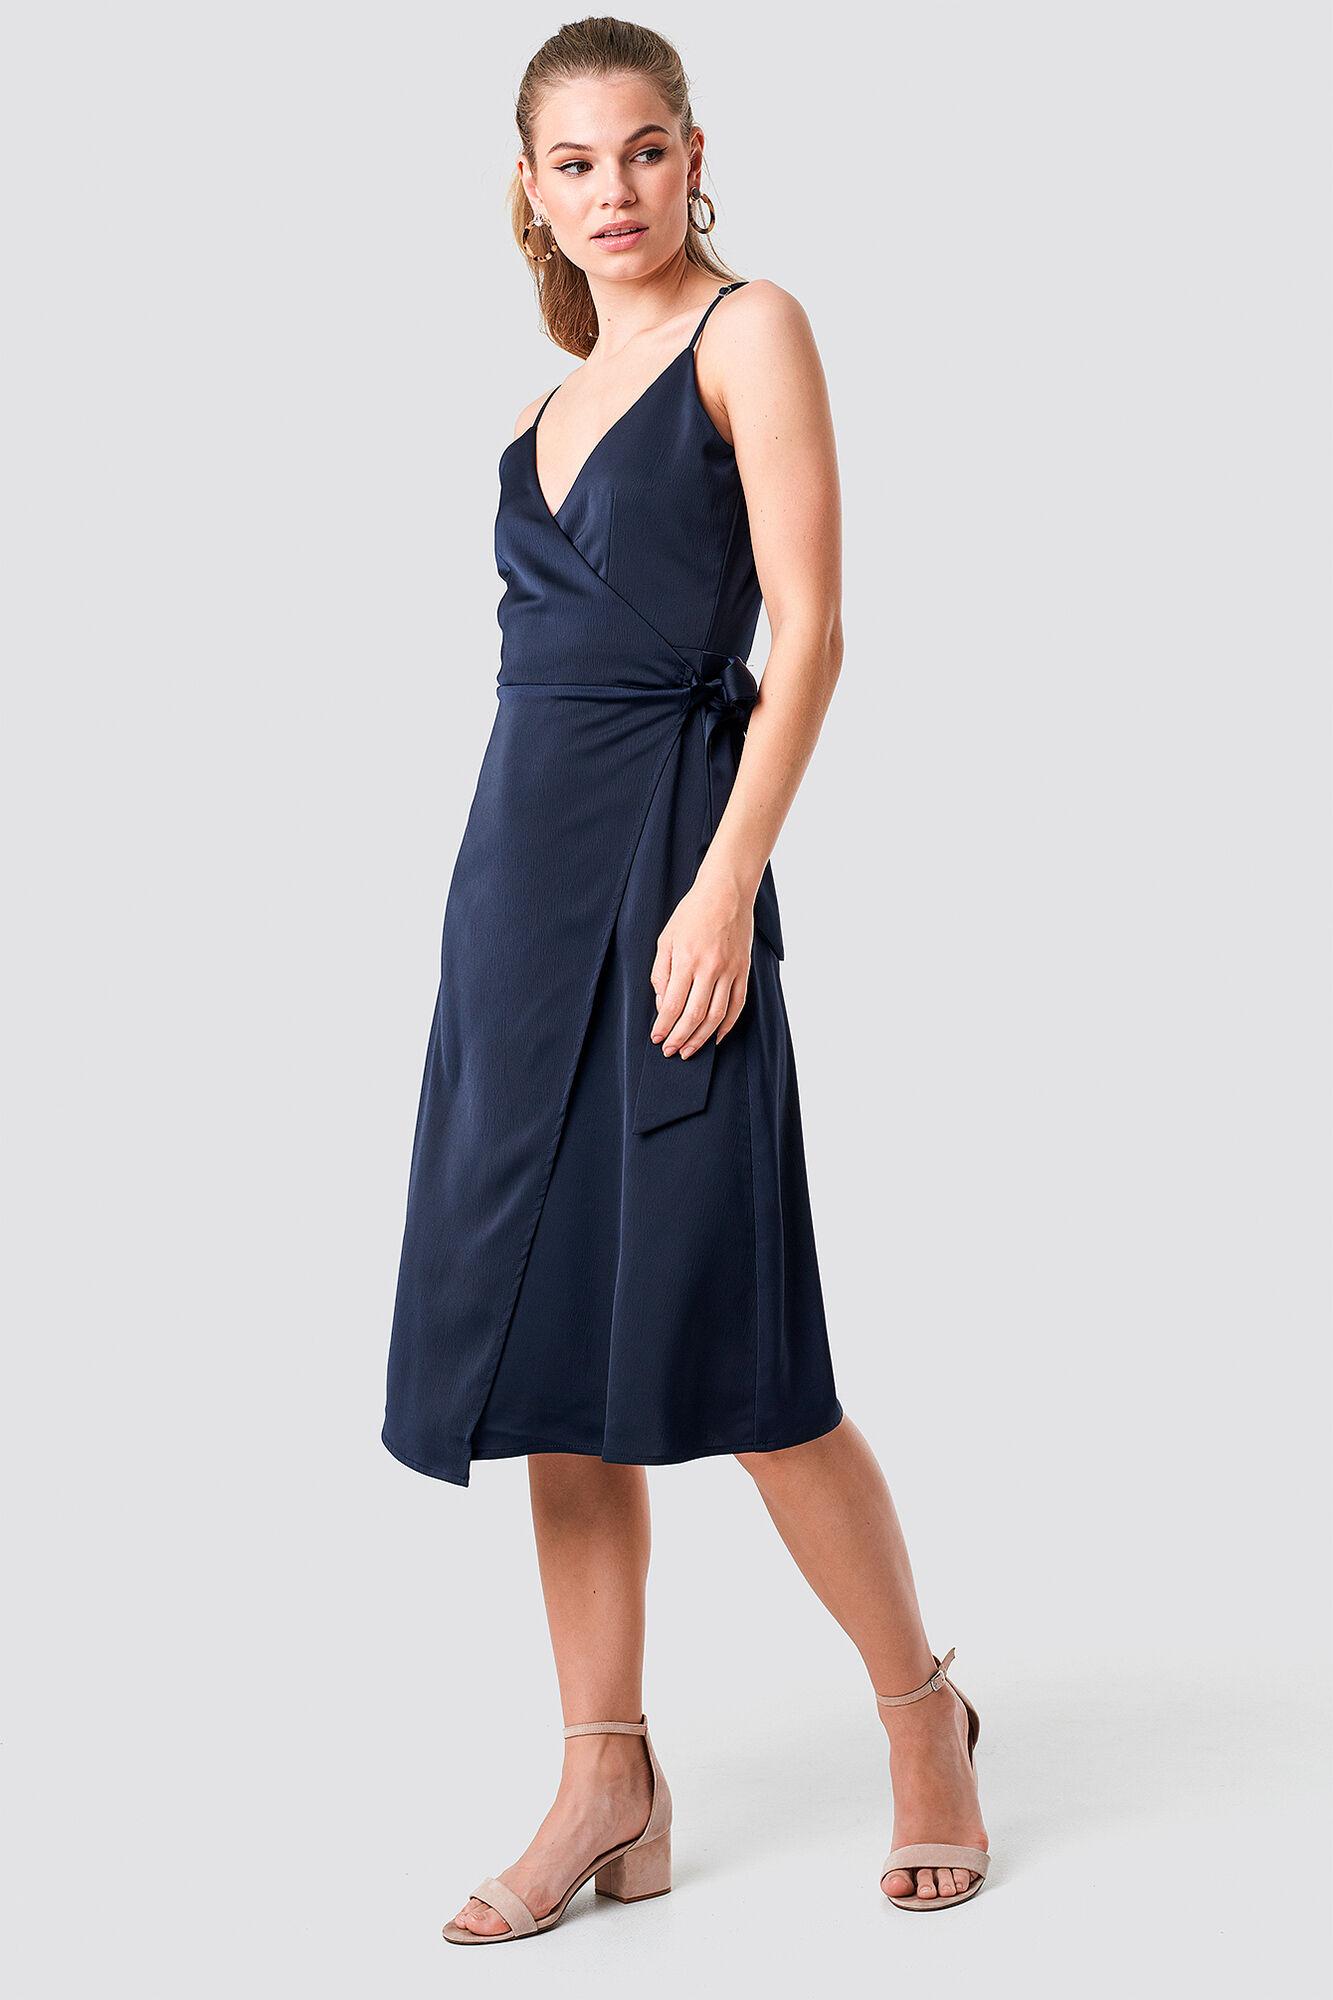 Wrapped midi dress 1100-001550, DARK NAVY